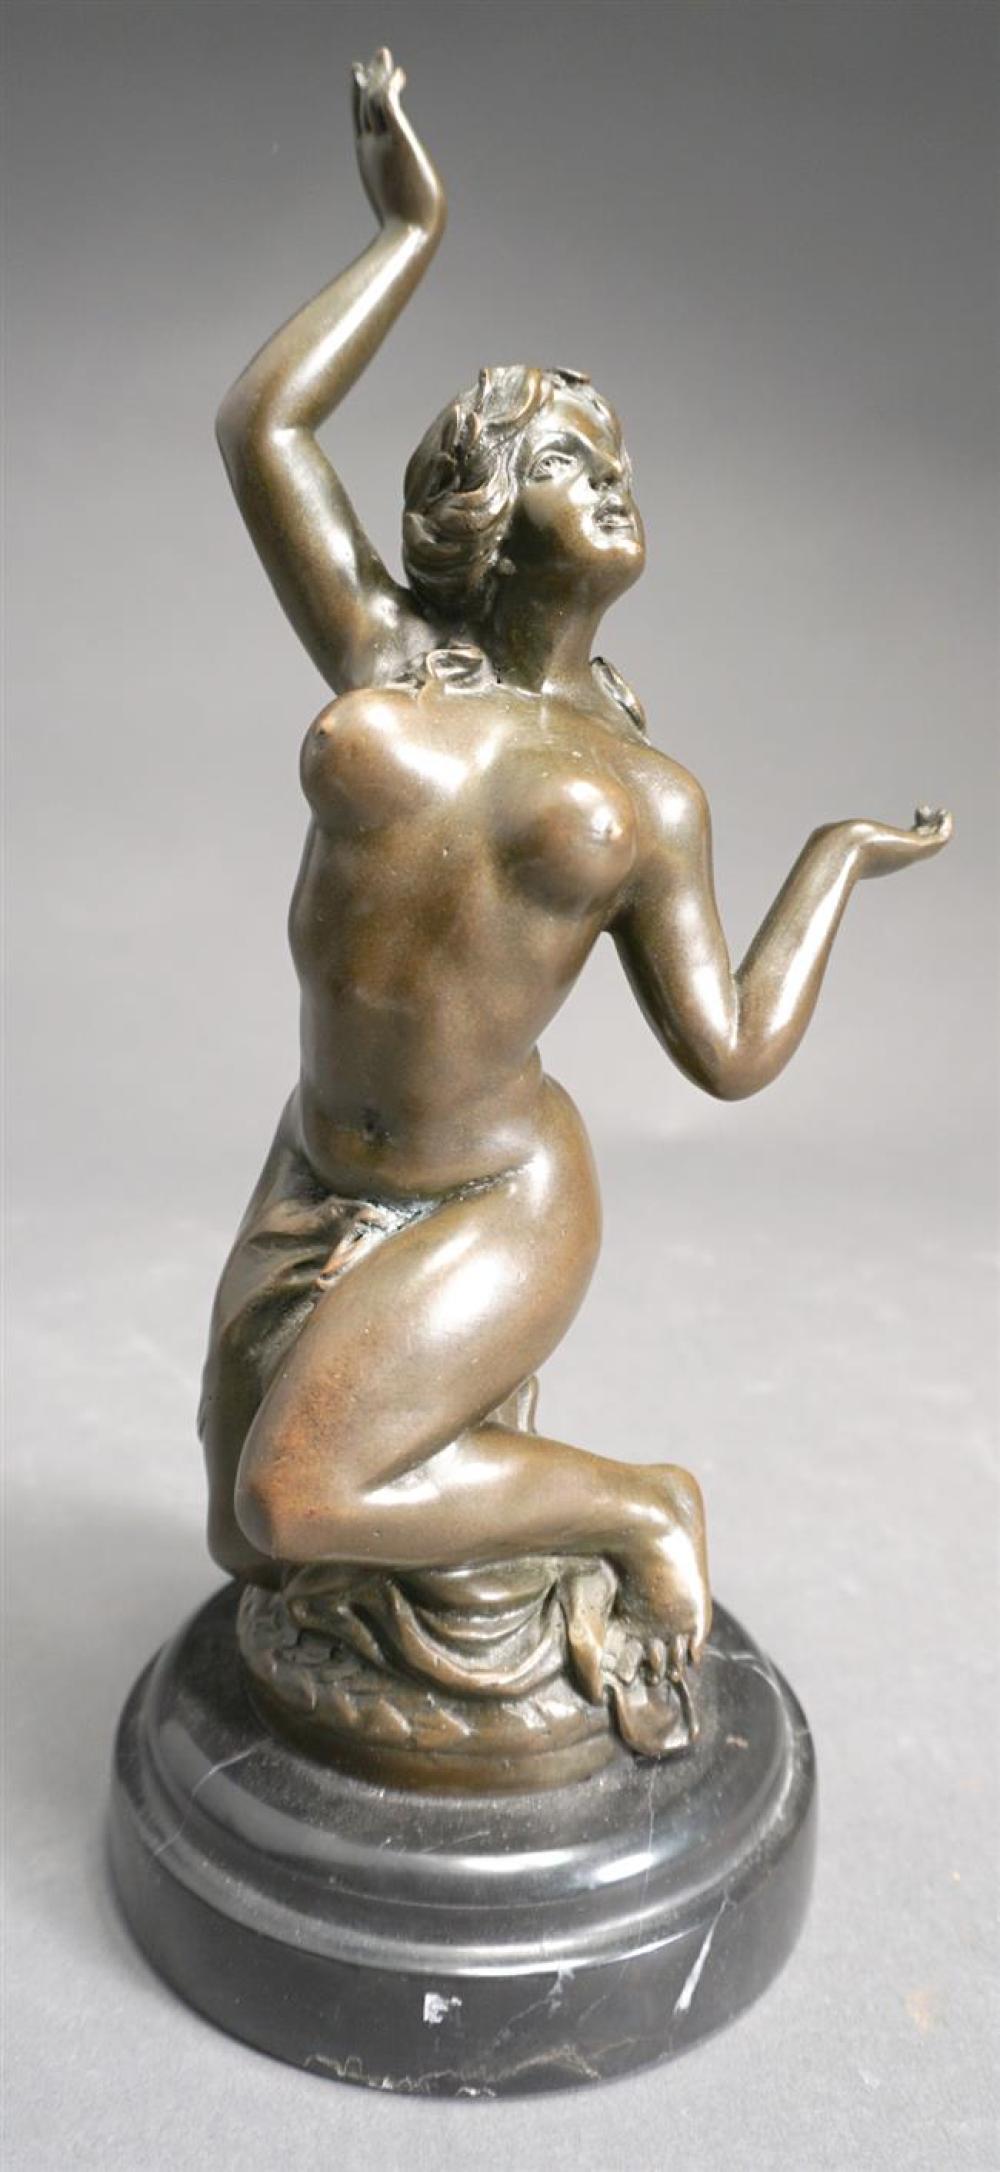 Miguel Fernando (Milo) Lopez (Portuguese, b 1955), Nude Woman, Bronze Sculpture on Black Marble Plinth, Height: 10-1/2 in